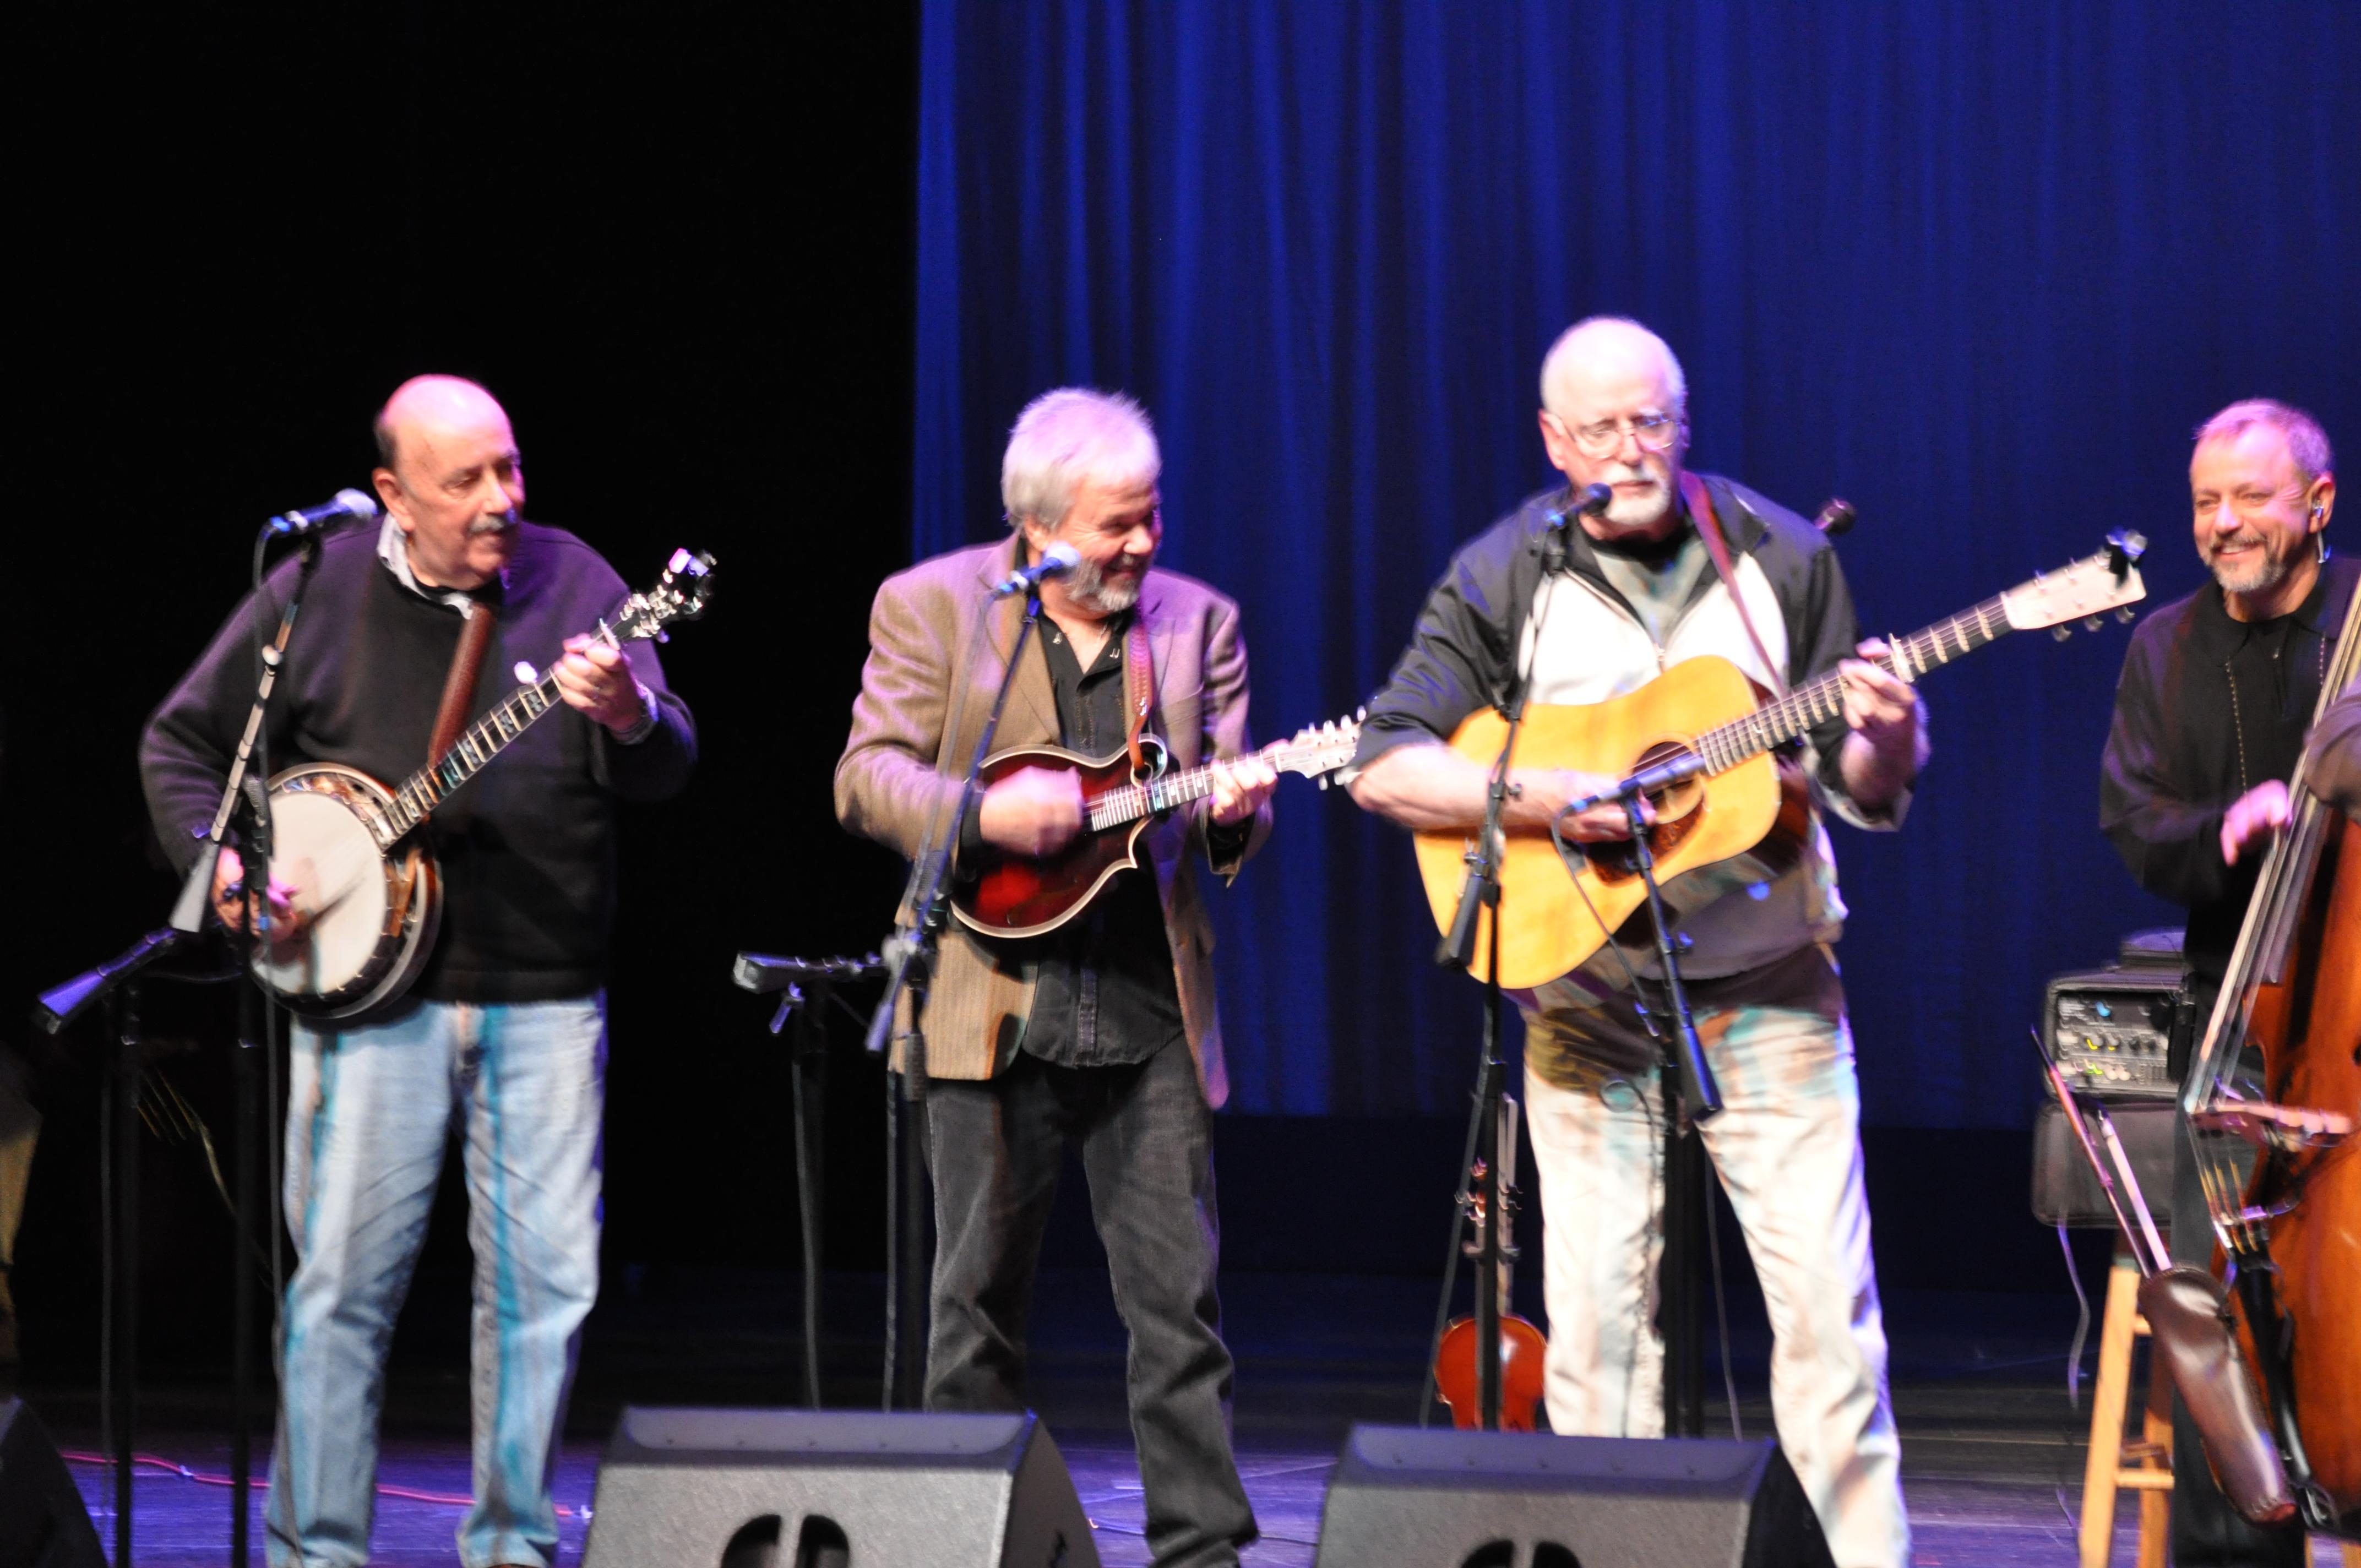 Ben Eldridge, Rickie Simpkins, John Starling, and Ronnie Simpkins